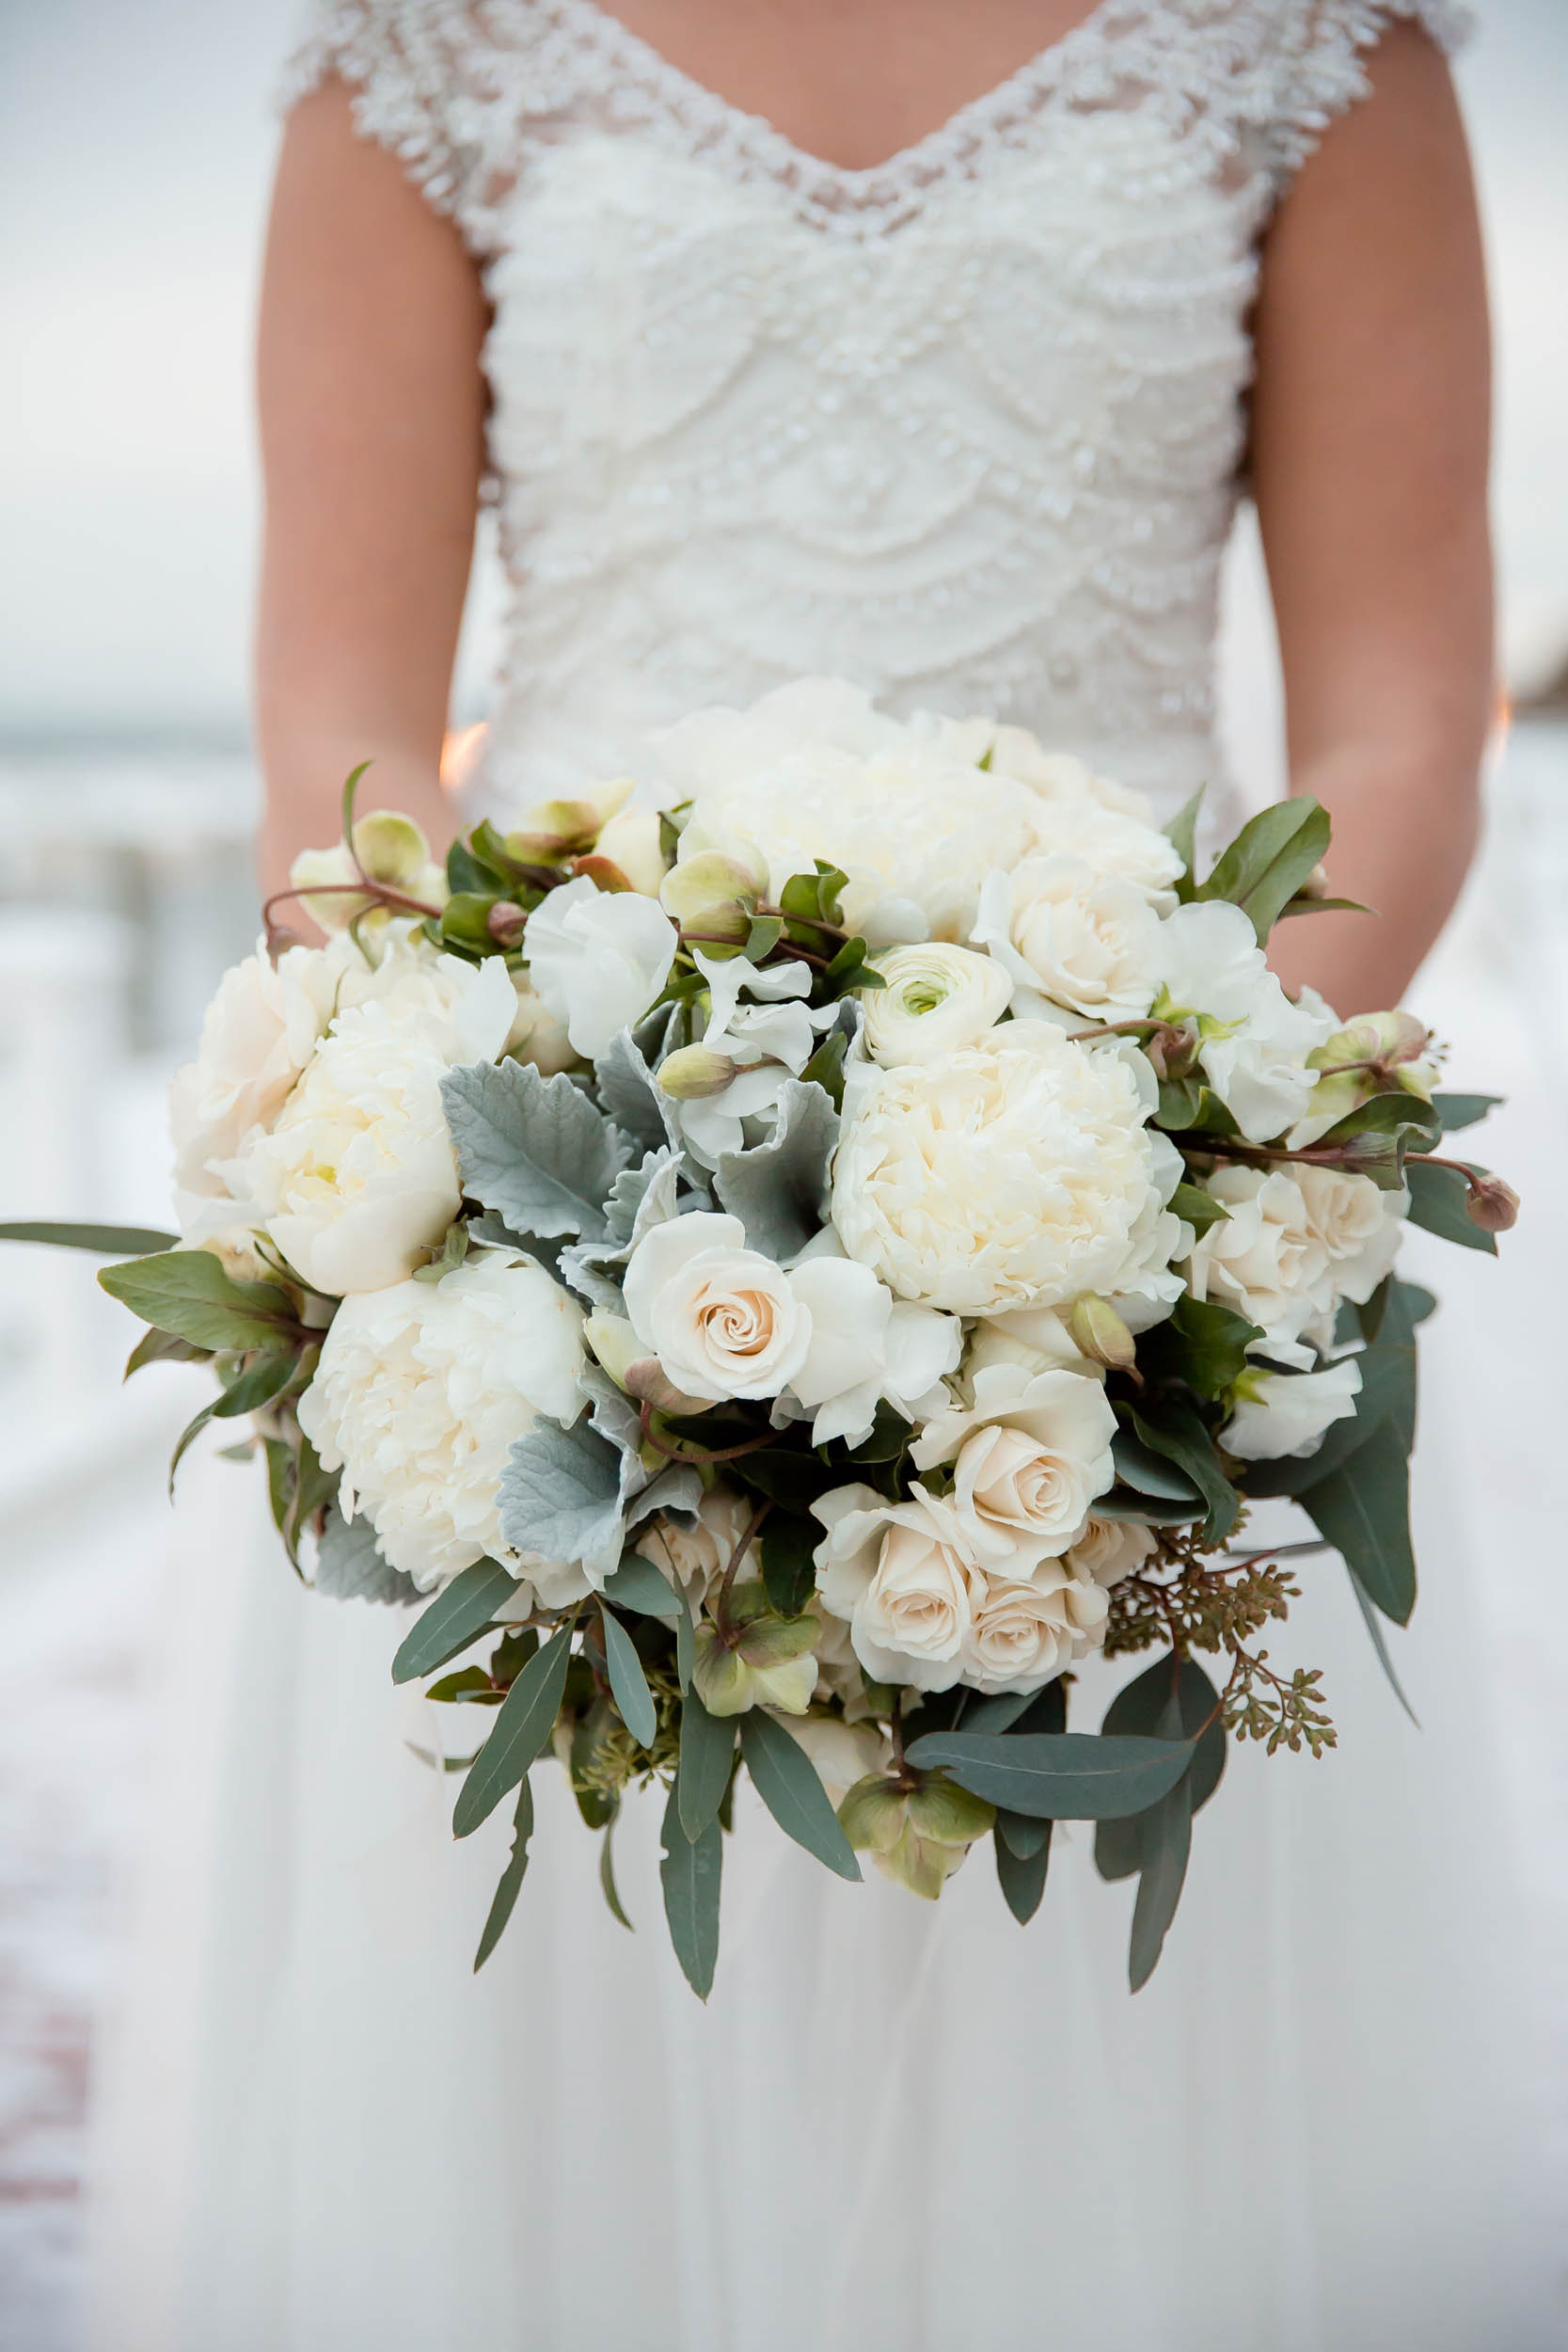 lilacs-florals-wedding-florist-bouquets-hires-023.jpg